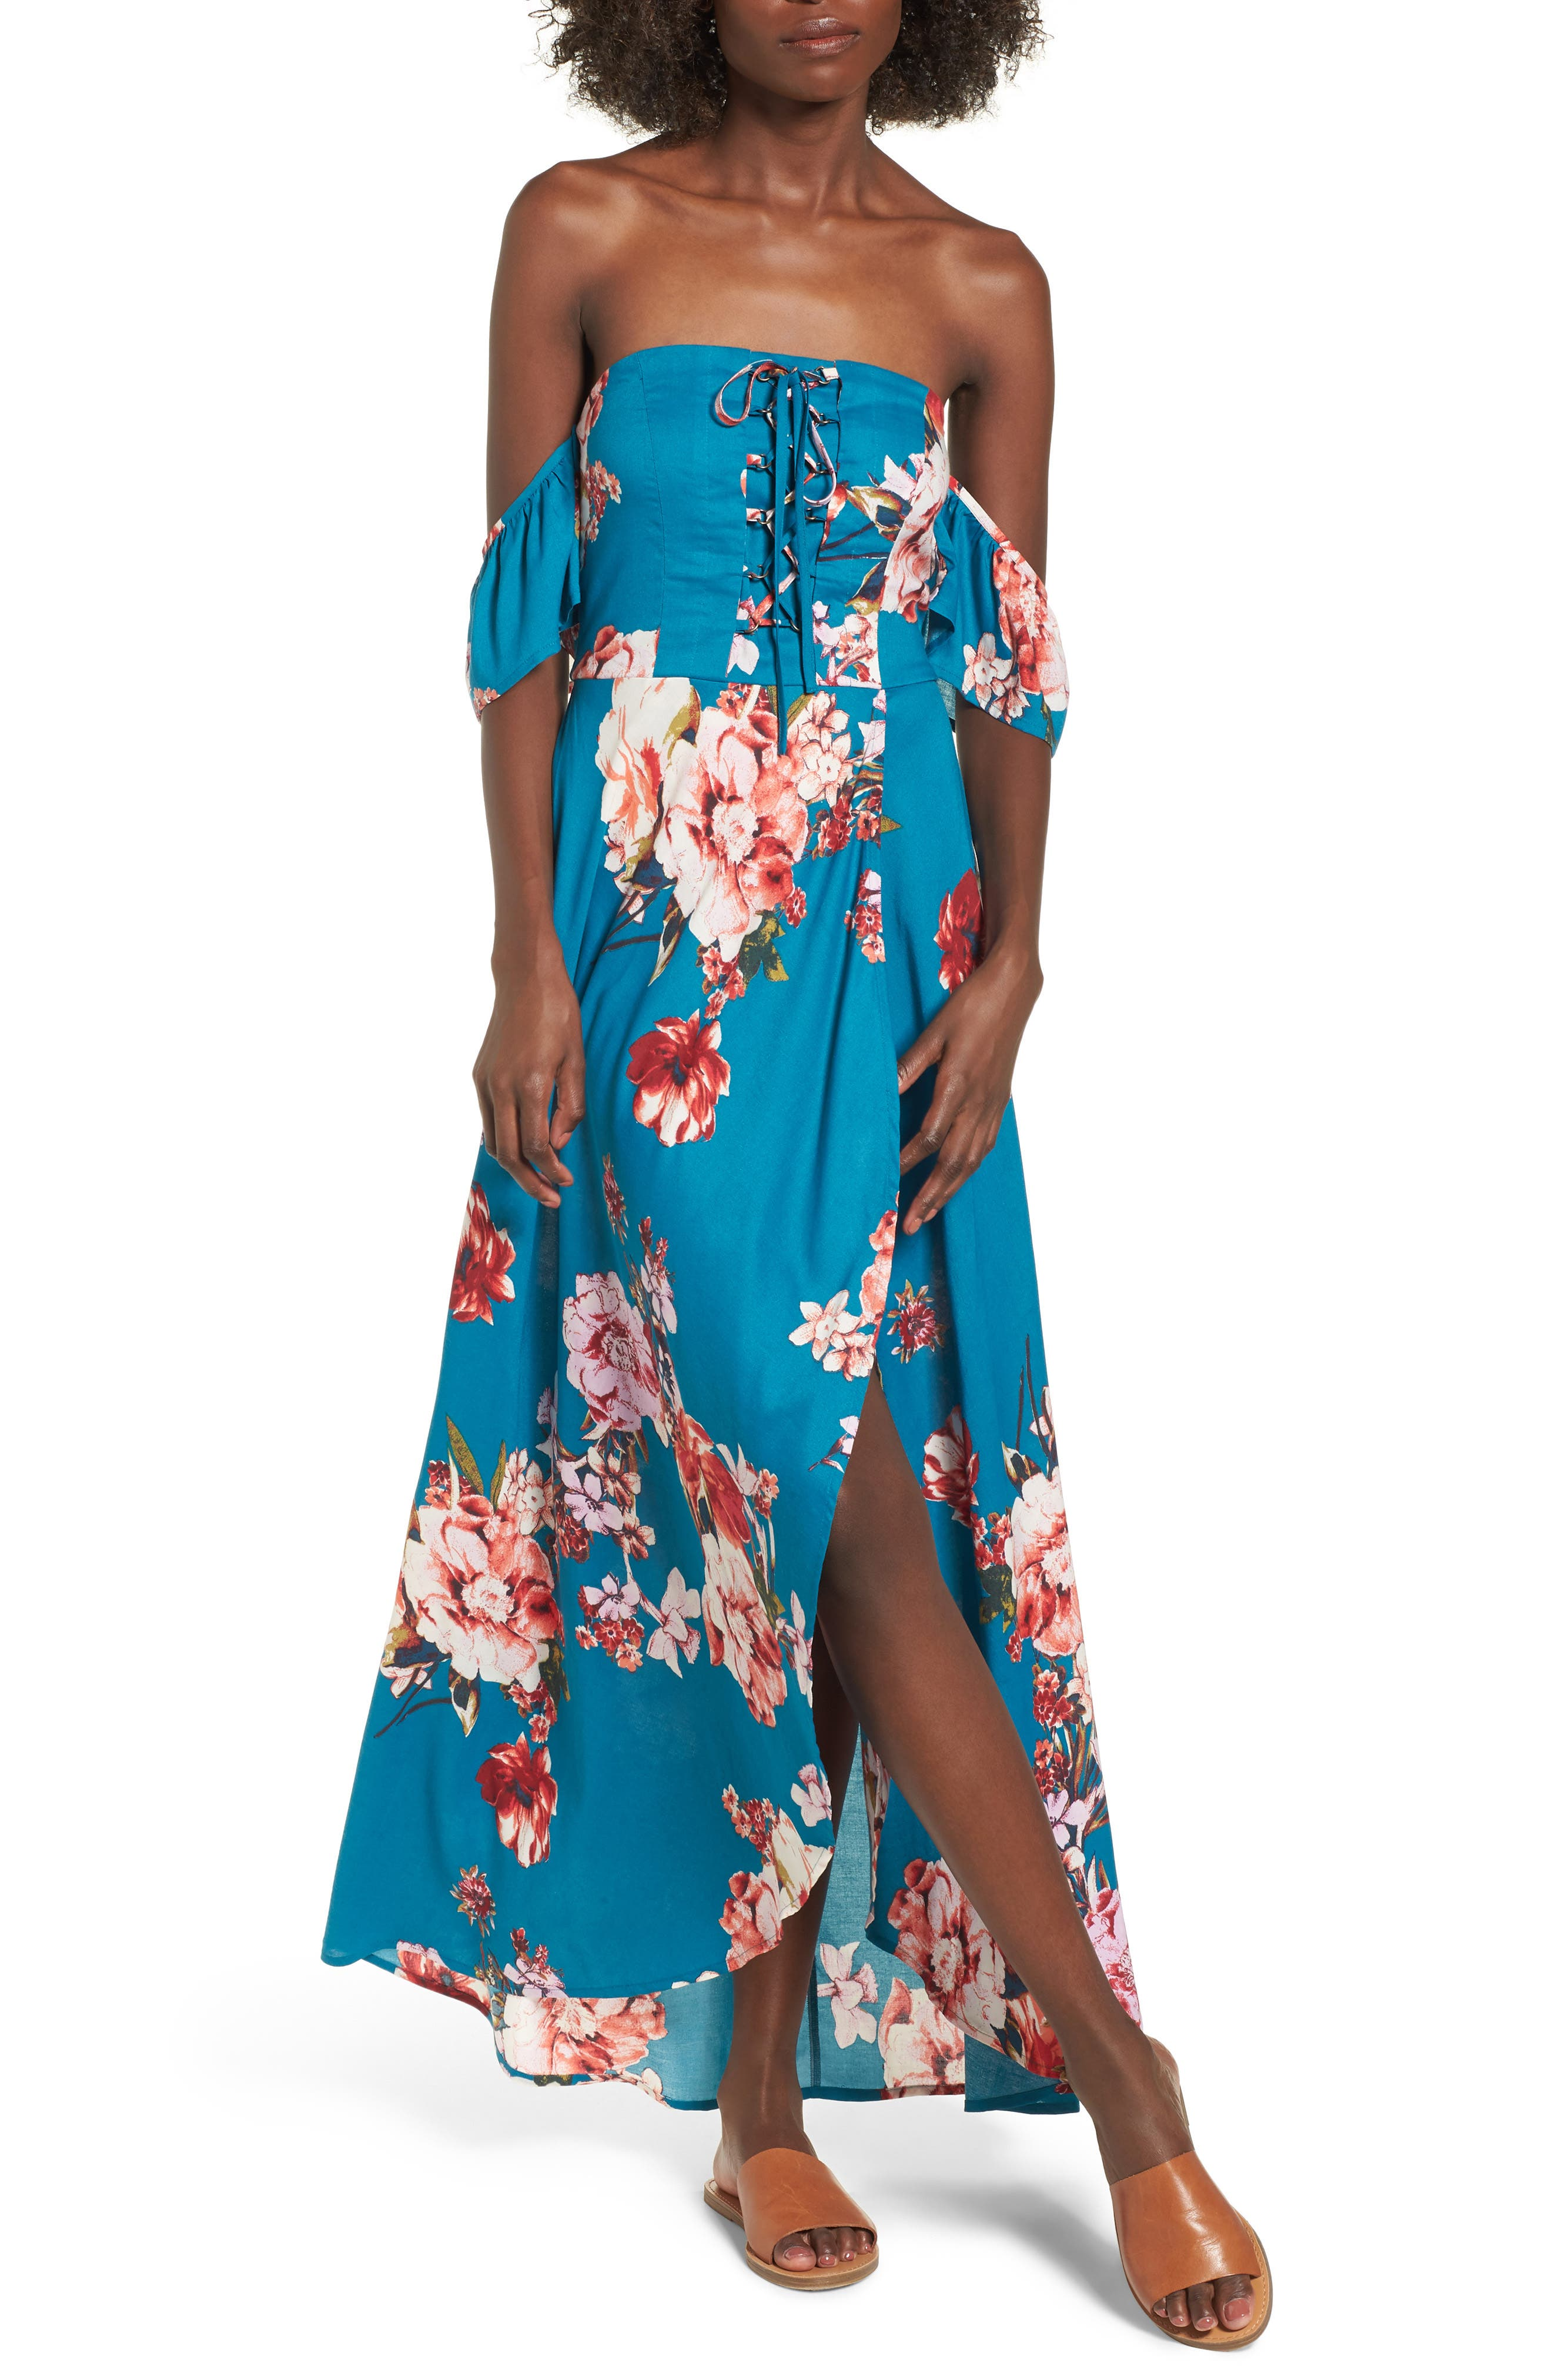 Lace Up Cold Shoulder Maxi Dress,                             Main thumbnail 1, color,                             Teal/ Peach